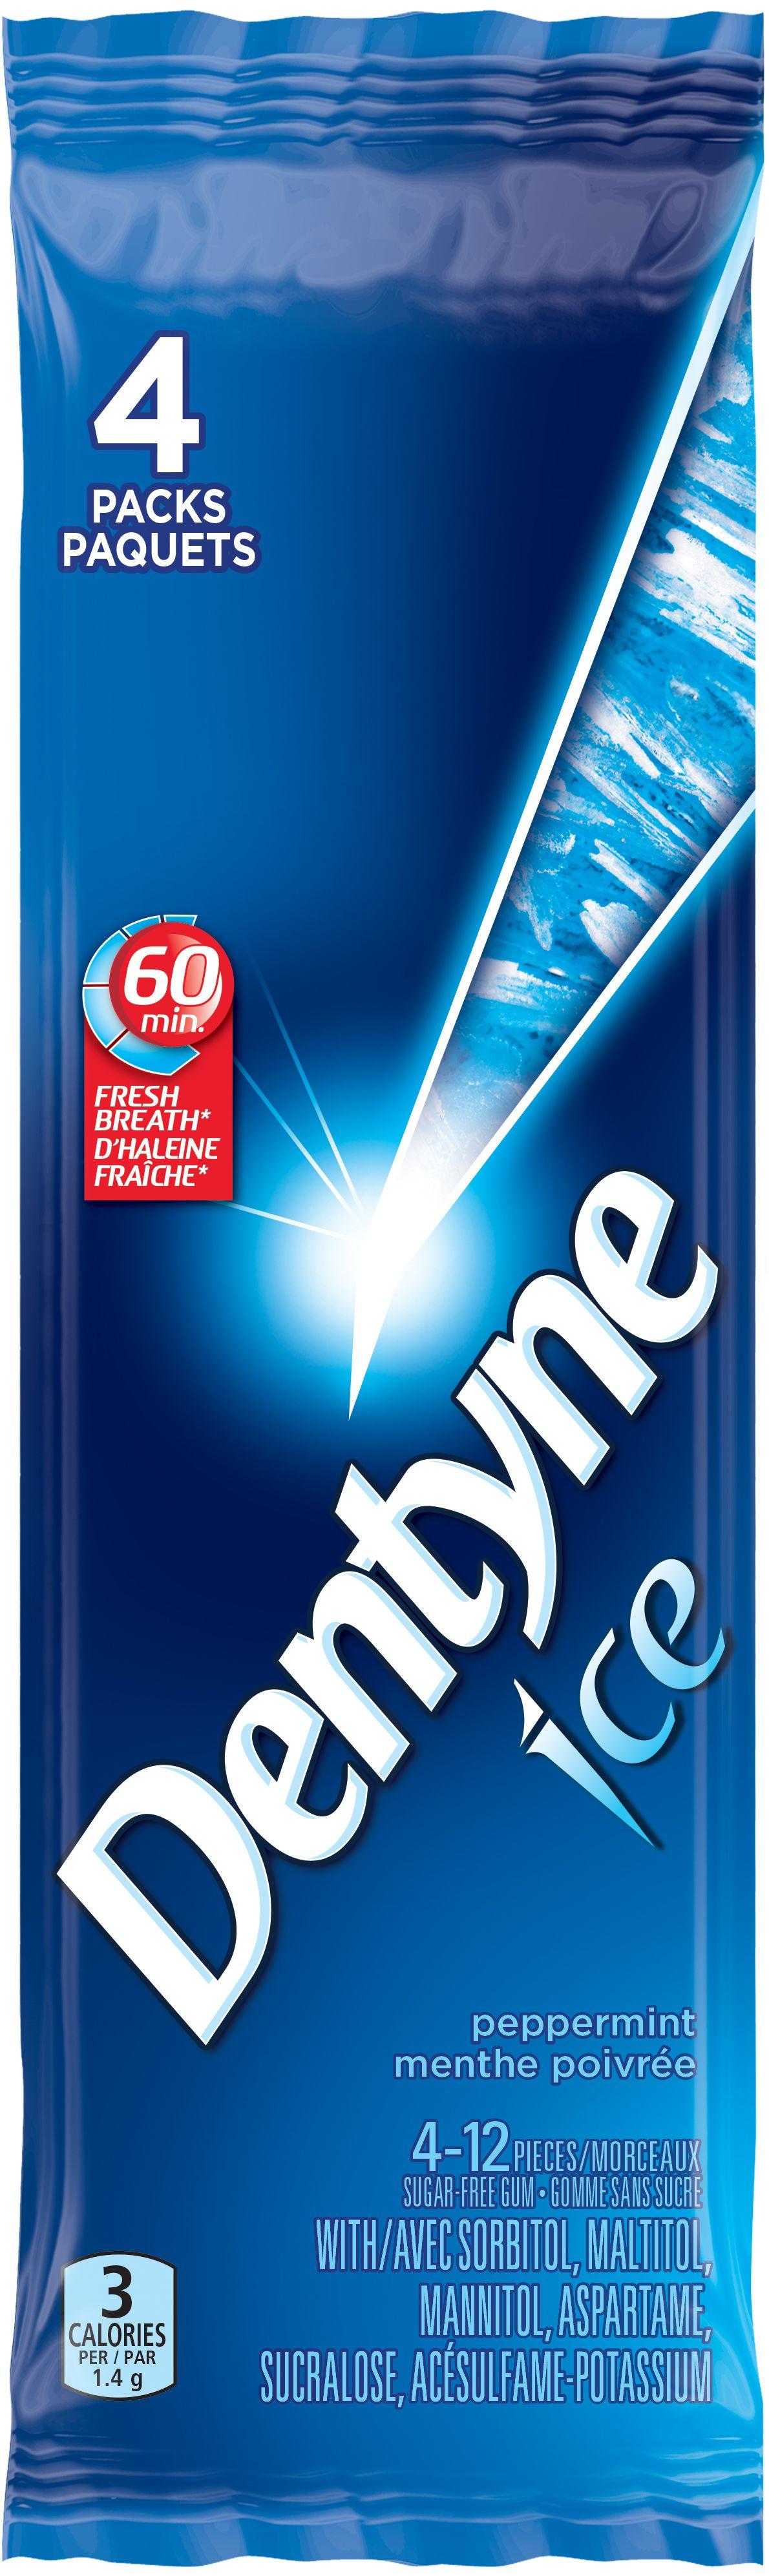 Dentyne Ice Peppermint Gum 48 Count